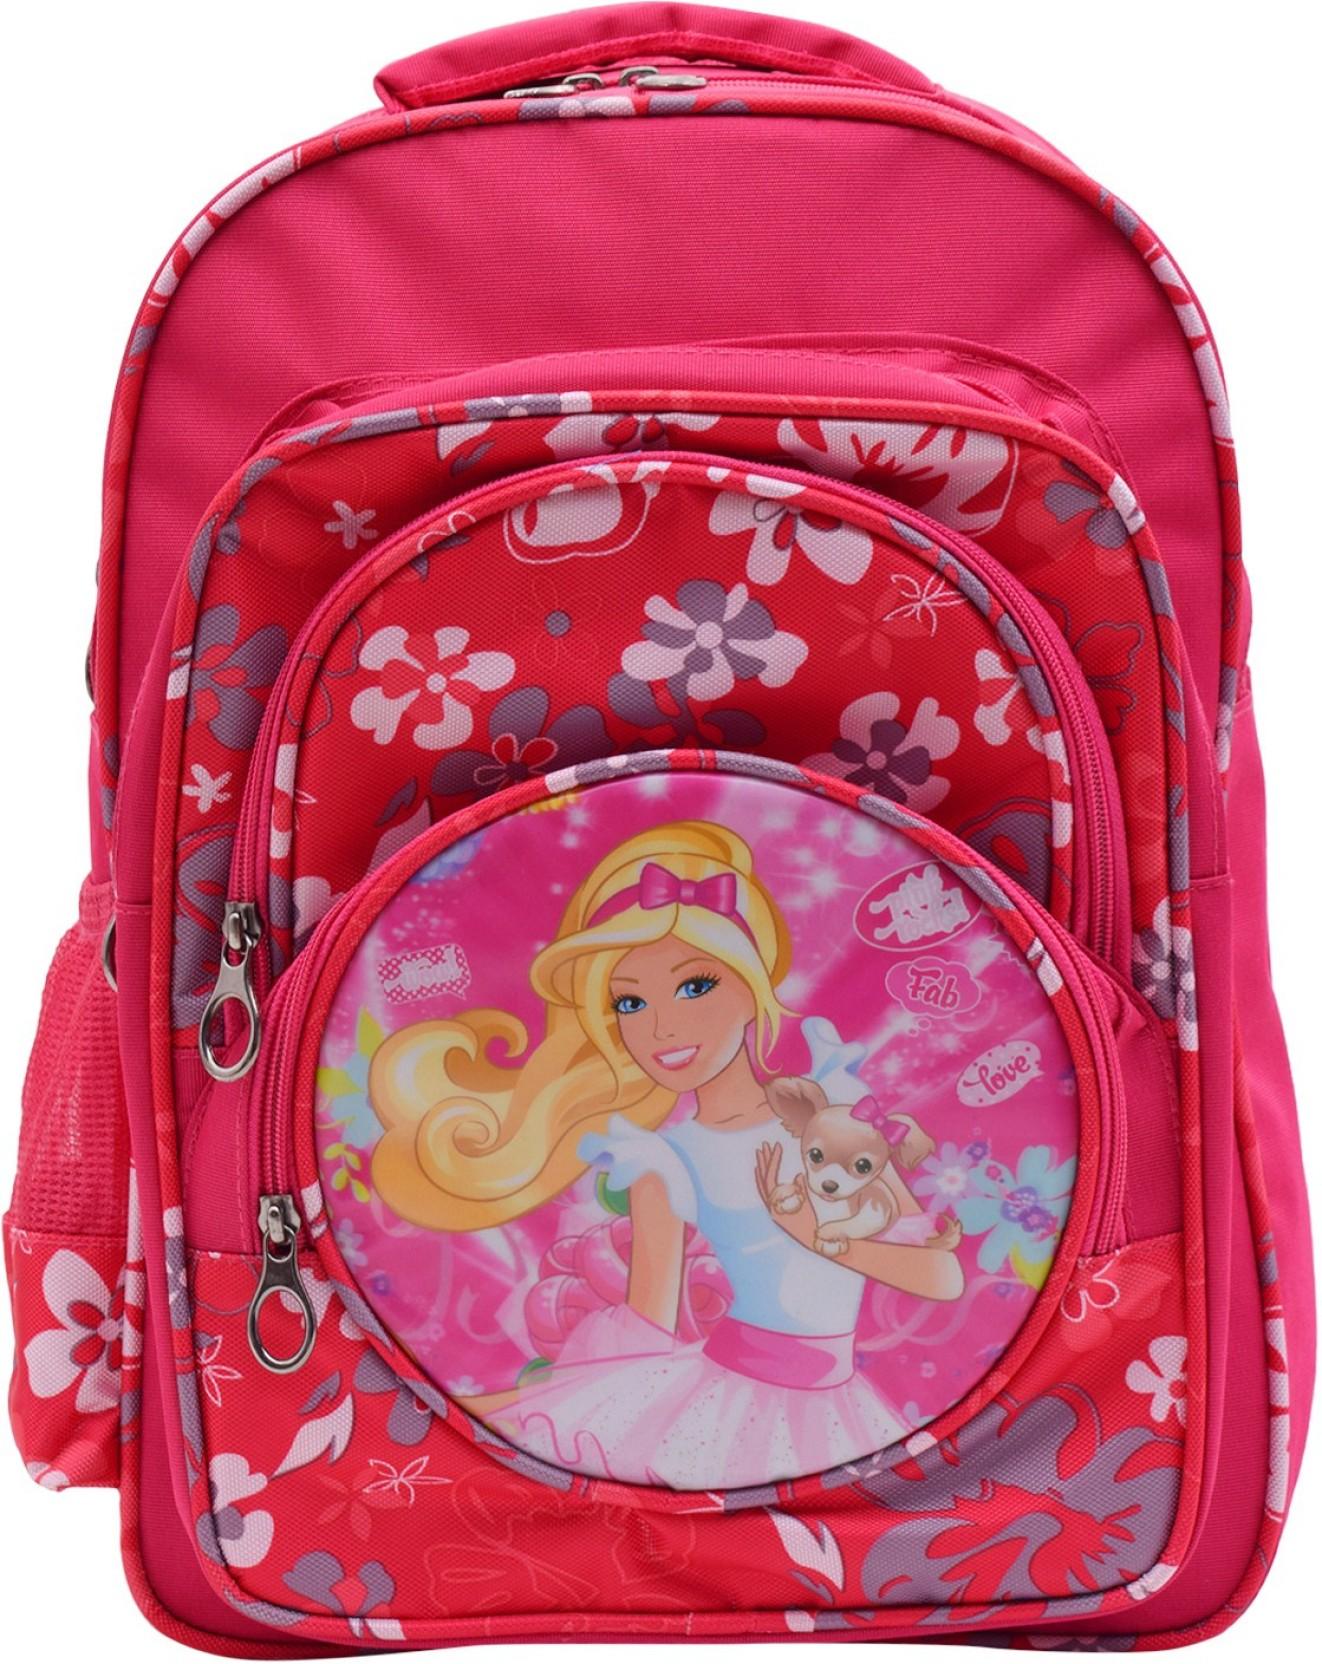 okji enterprises OKJI Frozen 18 Inches School Bag For girls- School Bag  Pack Age Group (5-11 Years) Pink Color Adjustable Strap Kids School bag  Waterproof ...